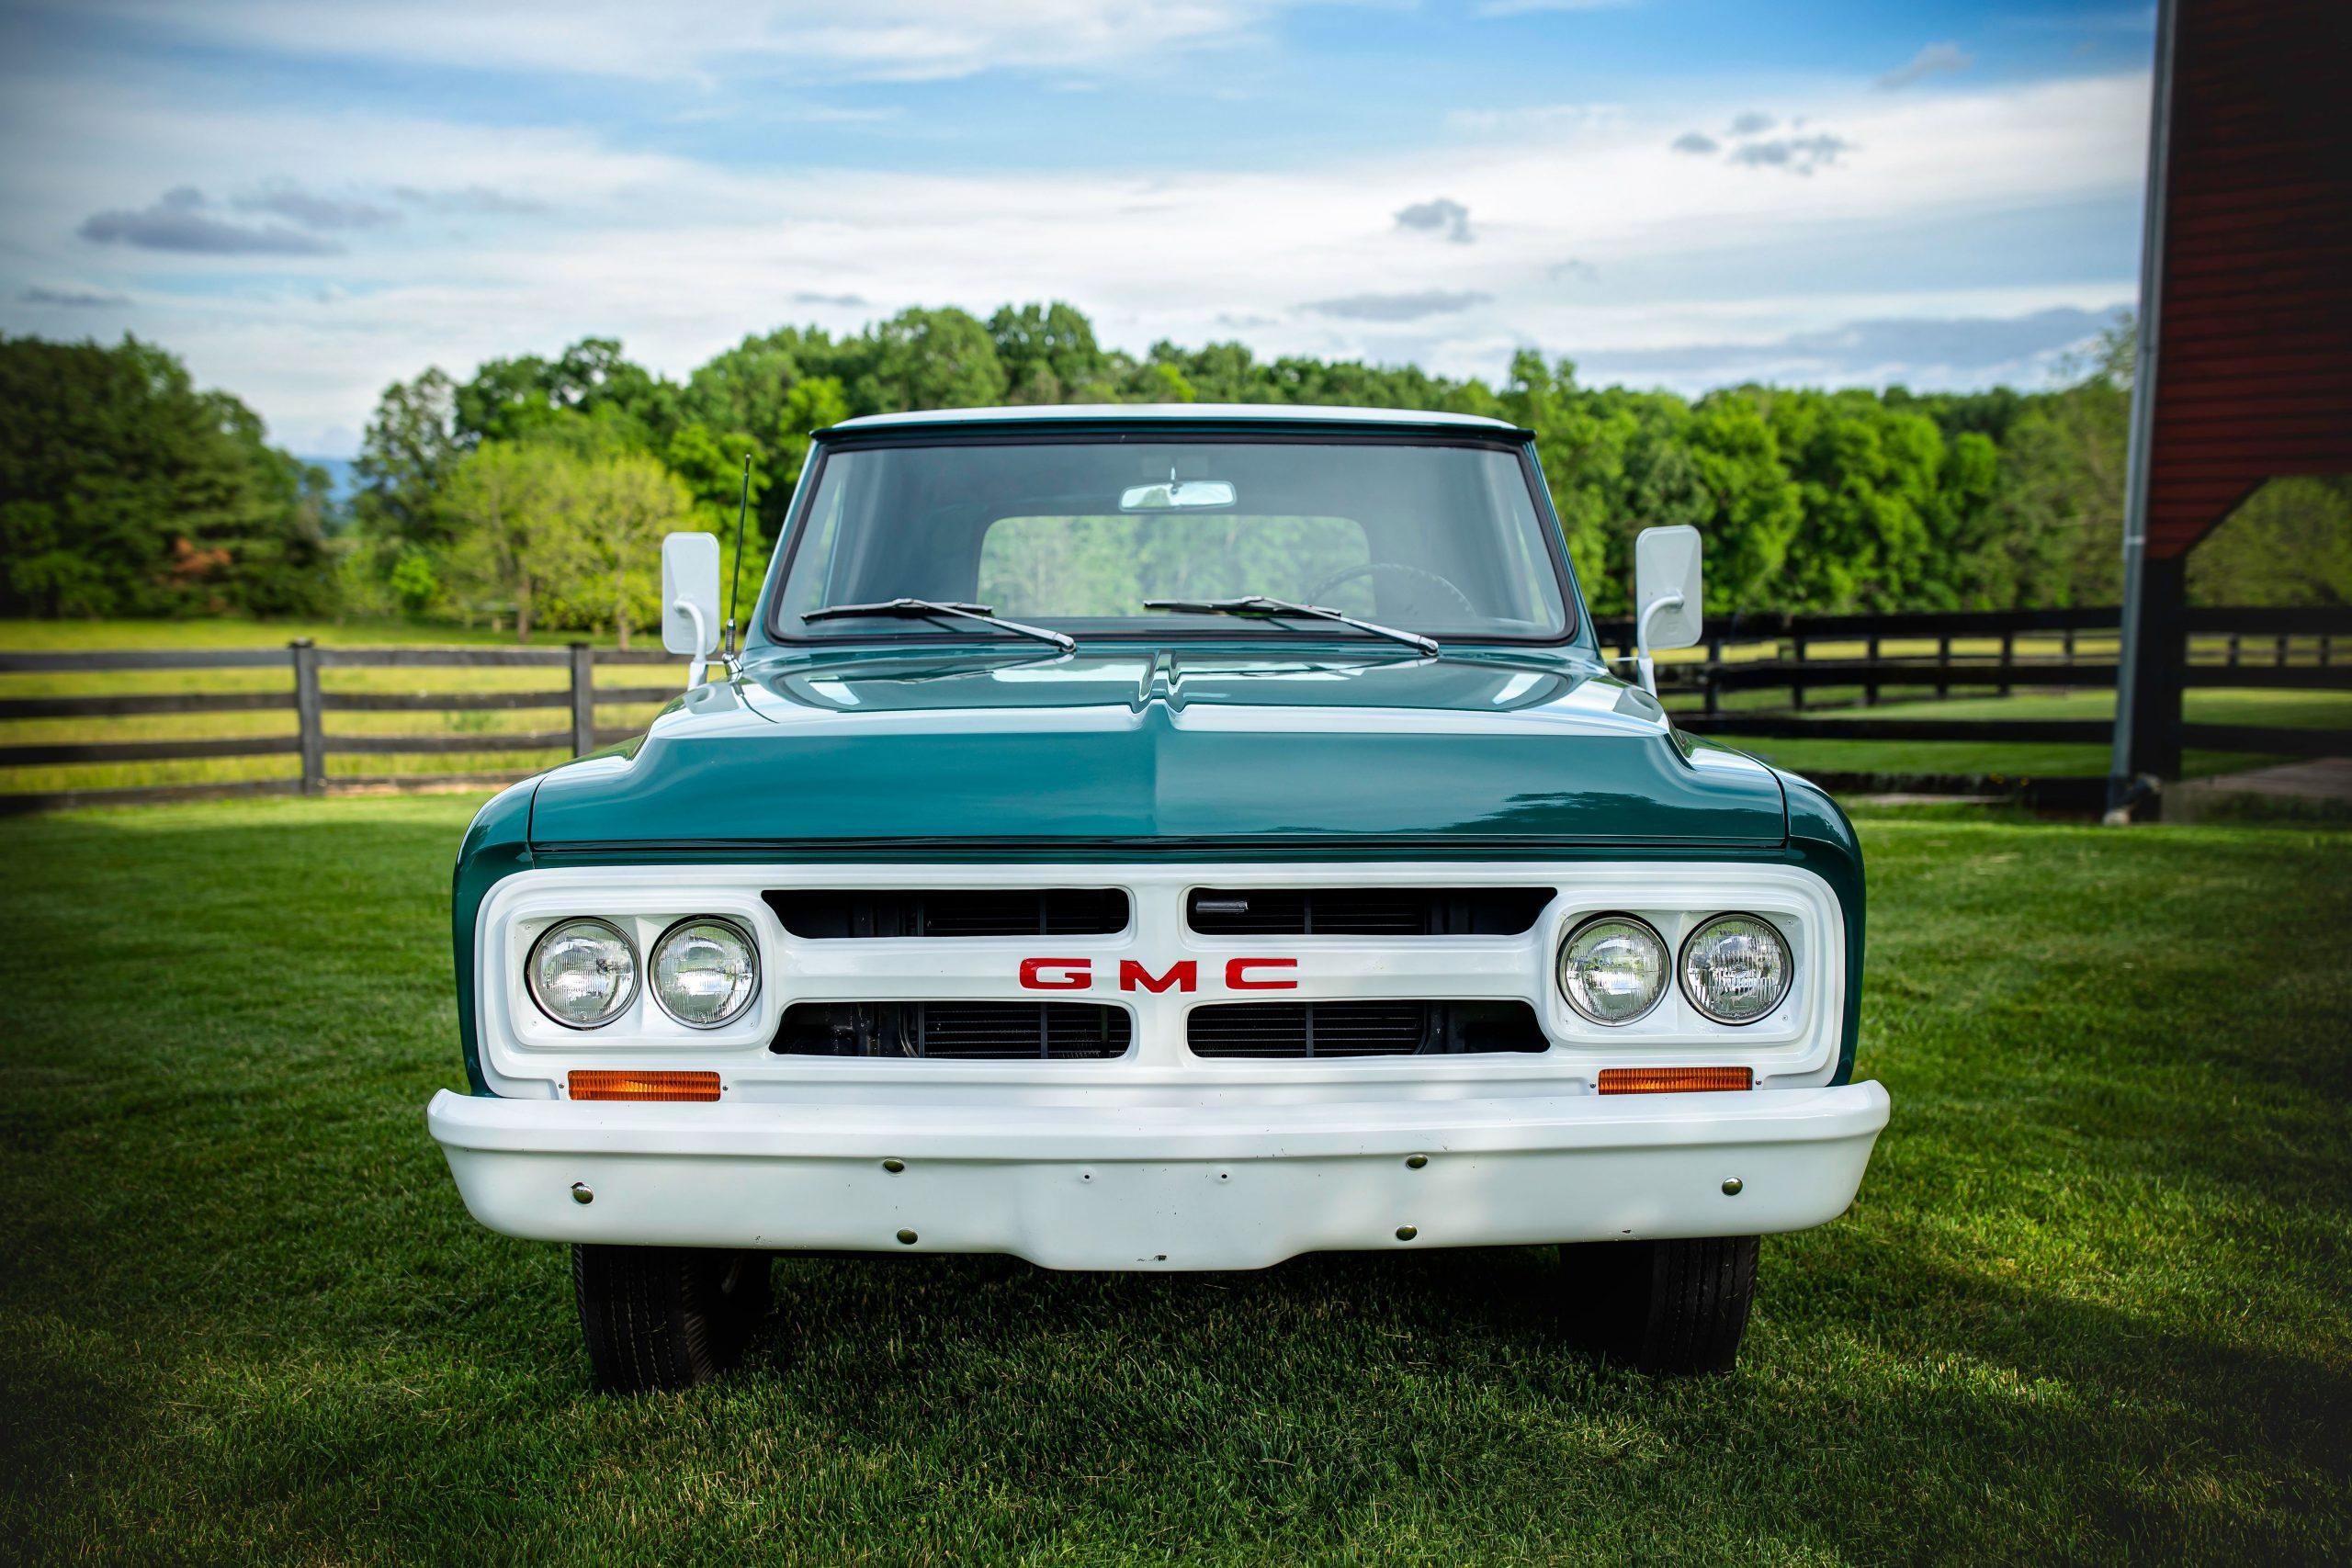 Elvis Presley Owned 1967 GMC Pickup front